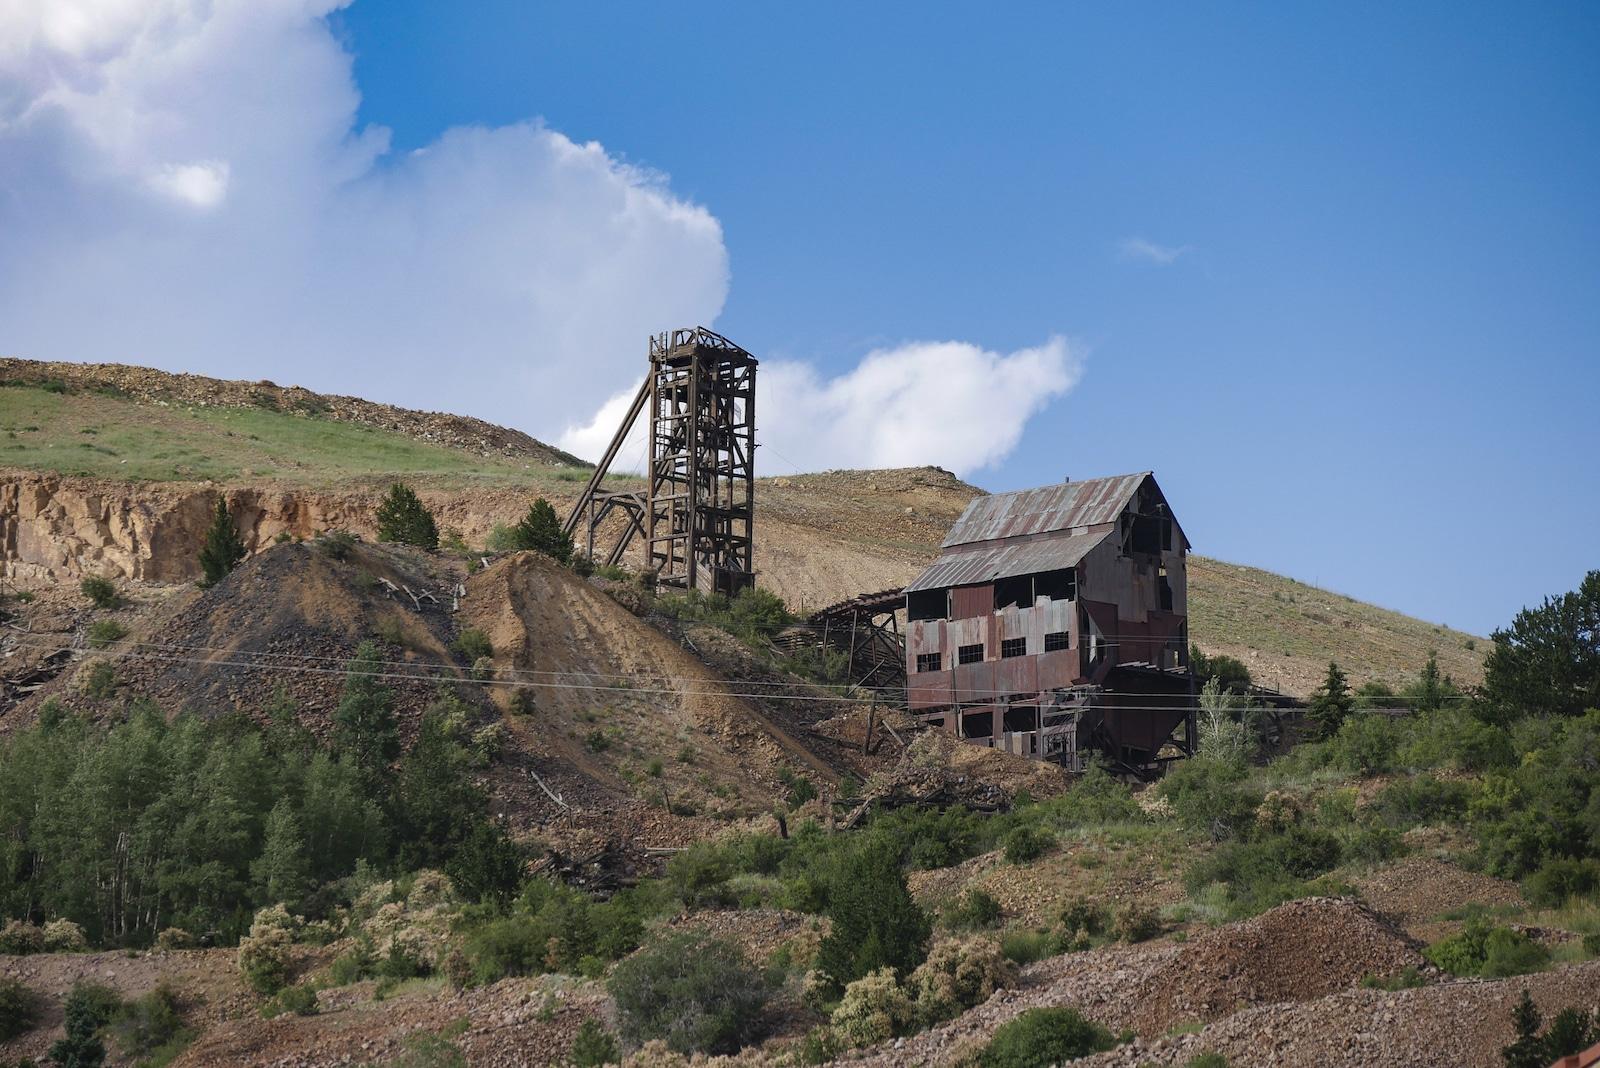 Abaikan Tambang yang menghadap ke Victor, Colorado